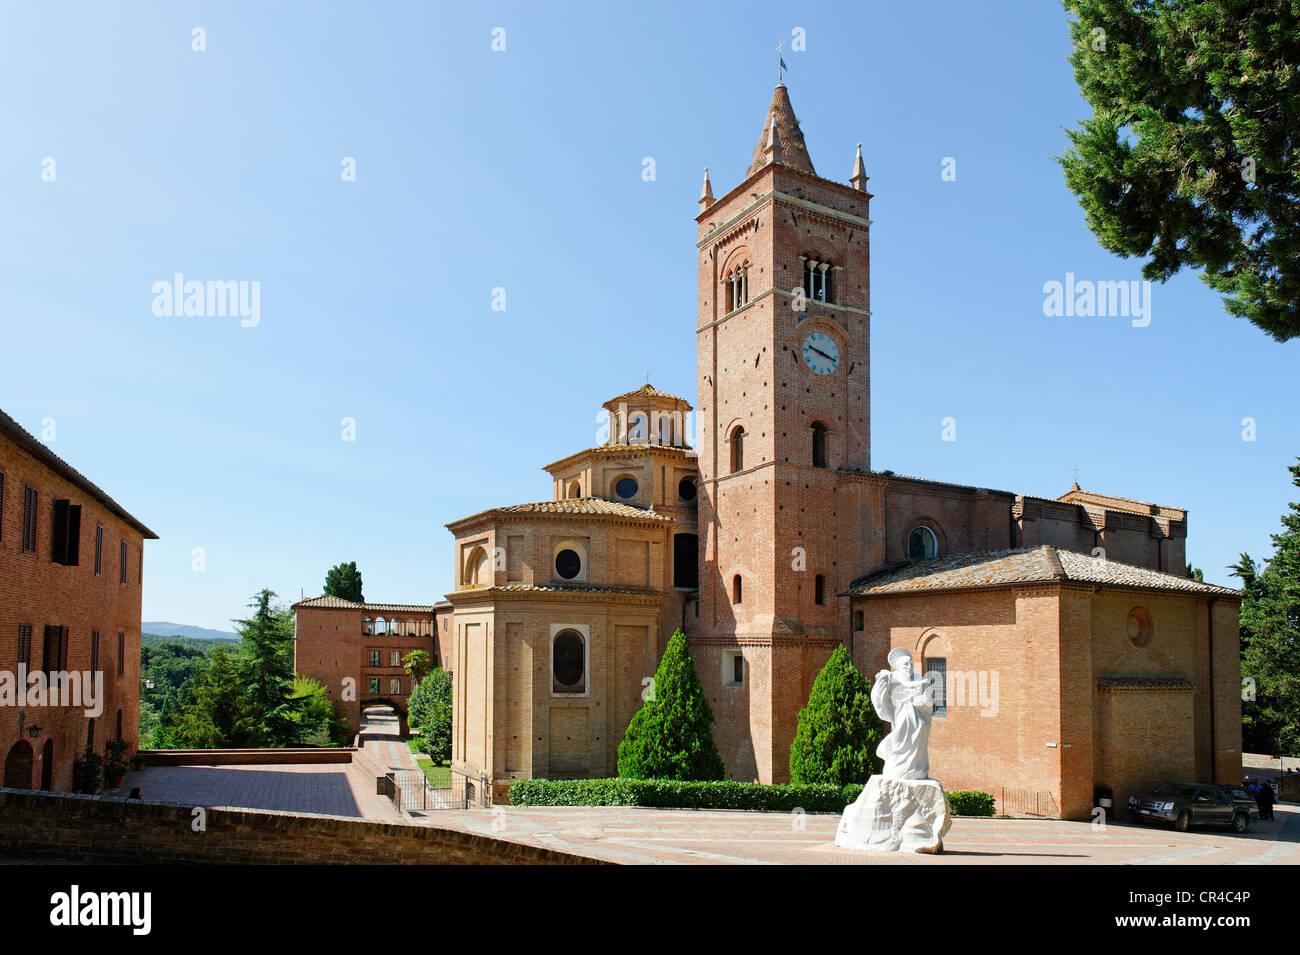 Benedictine monastery, territorial abbey of Monte Oliveto Maggiore, south of Siena, Crete Senesi, Tuscany, Italy, - Stock Image